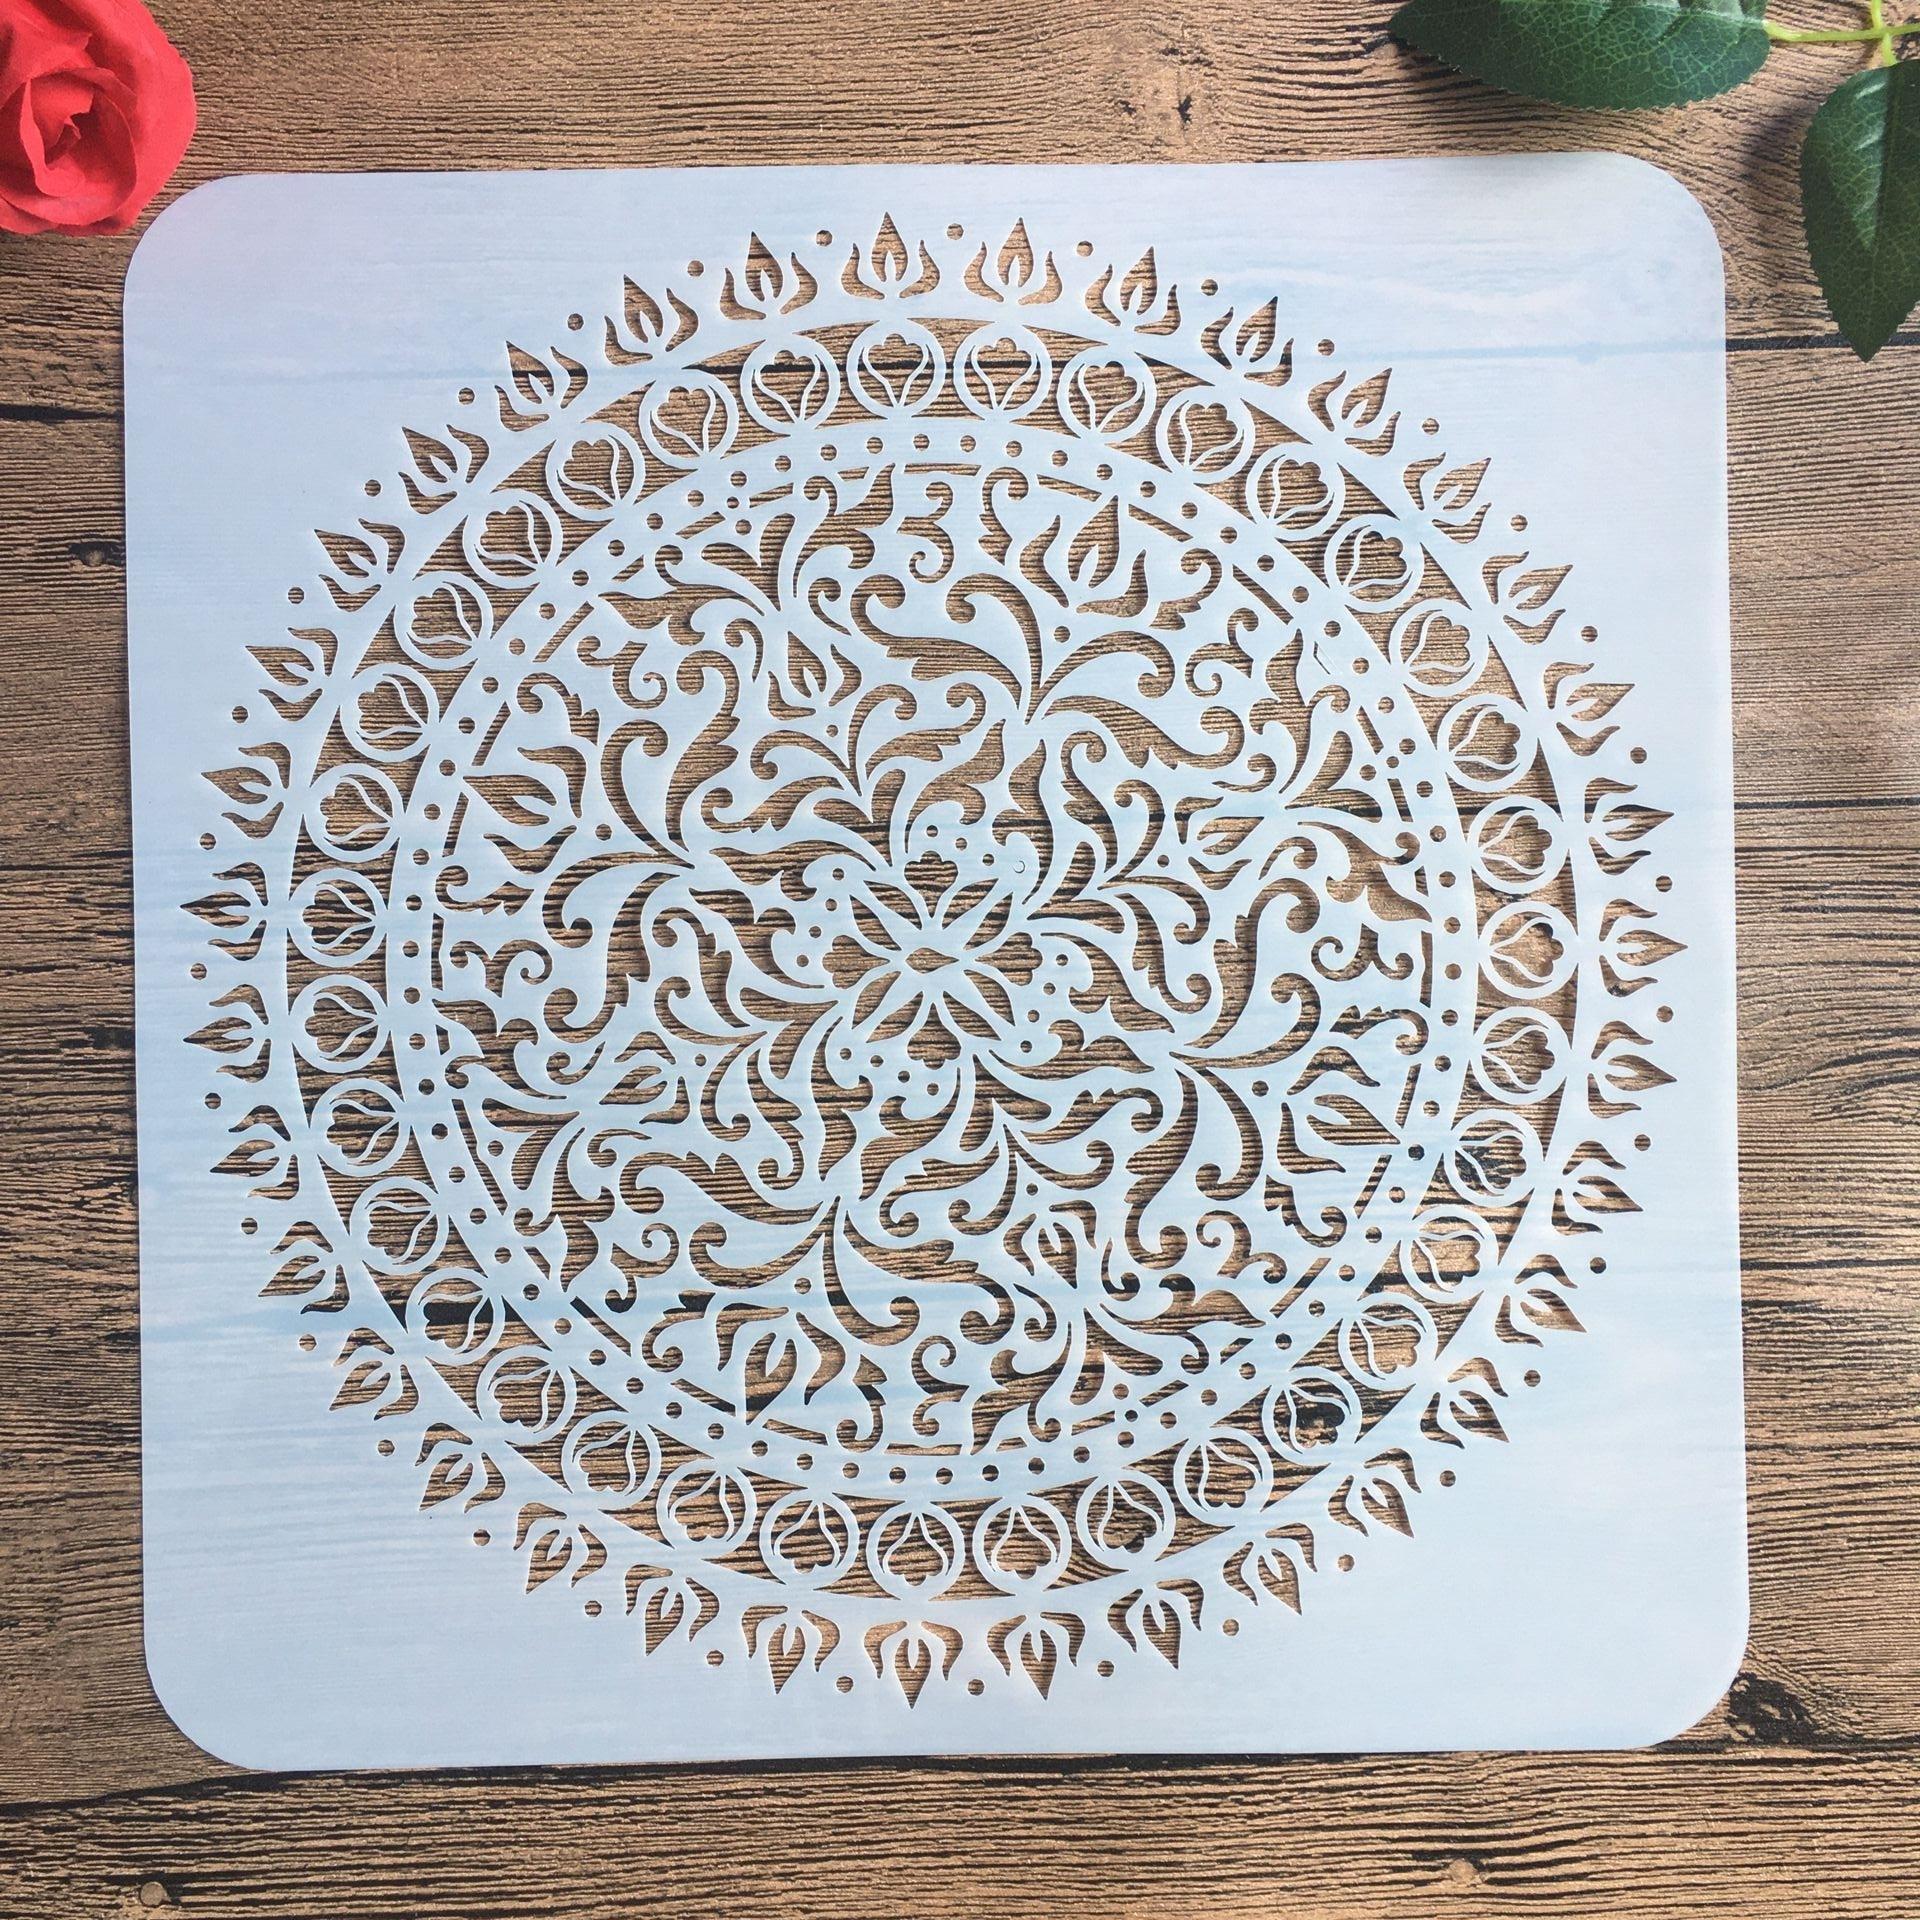 30 * 30 Cm Large Round Flower Mandala Diy Stencil Painting Scrapbook Coloring Engraving Album Decoration Template Stencil -c